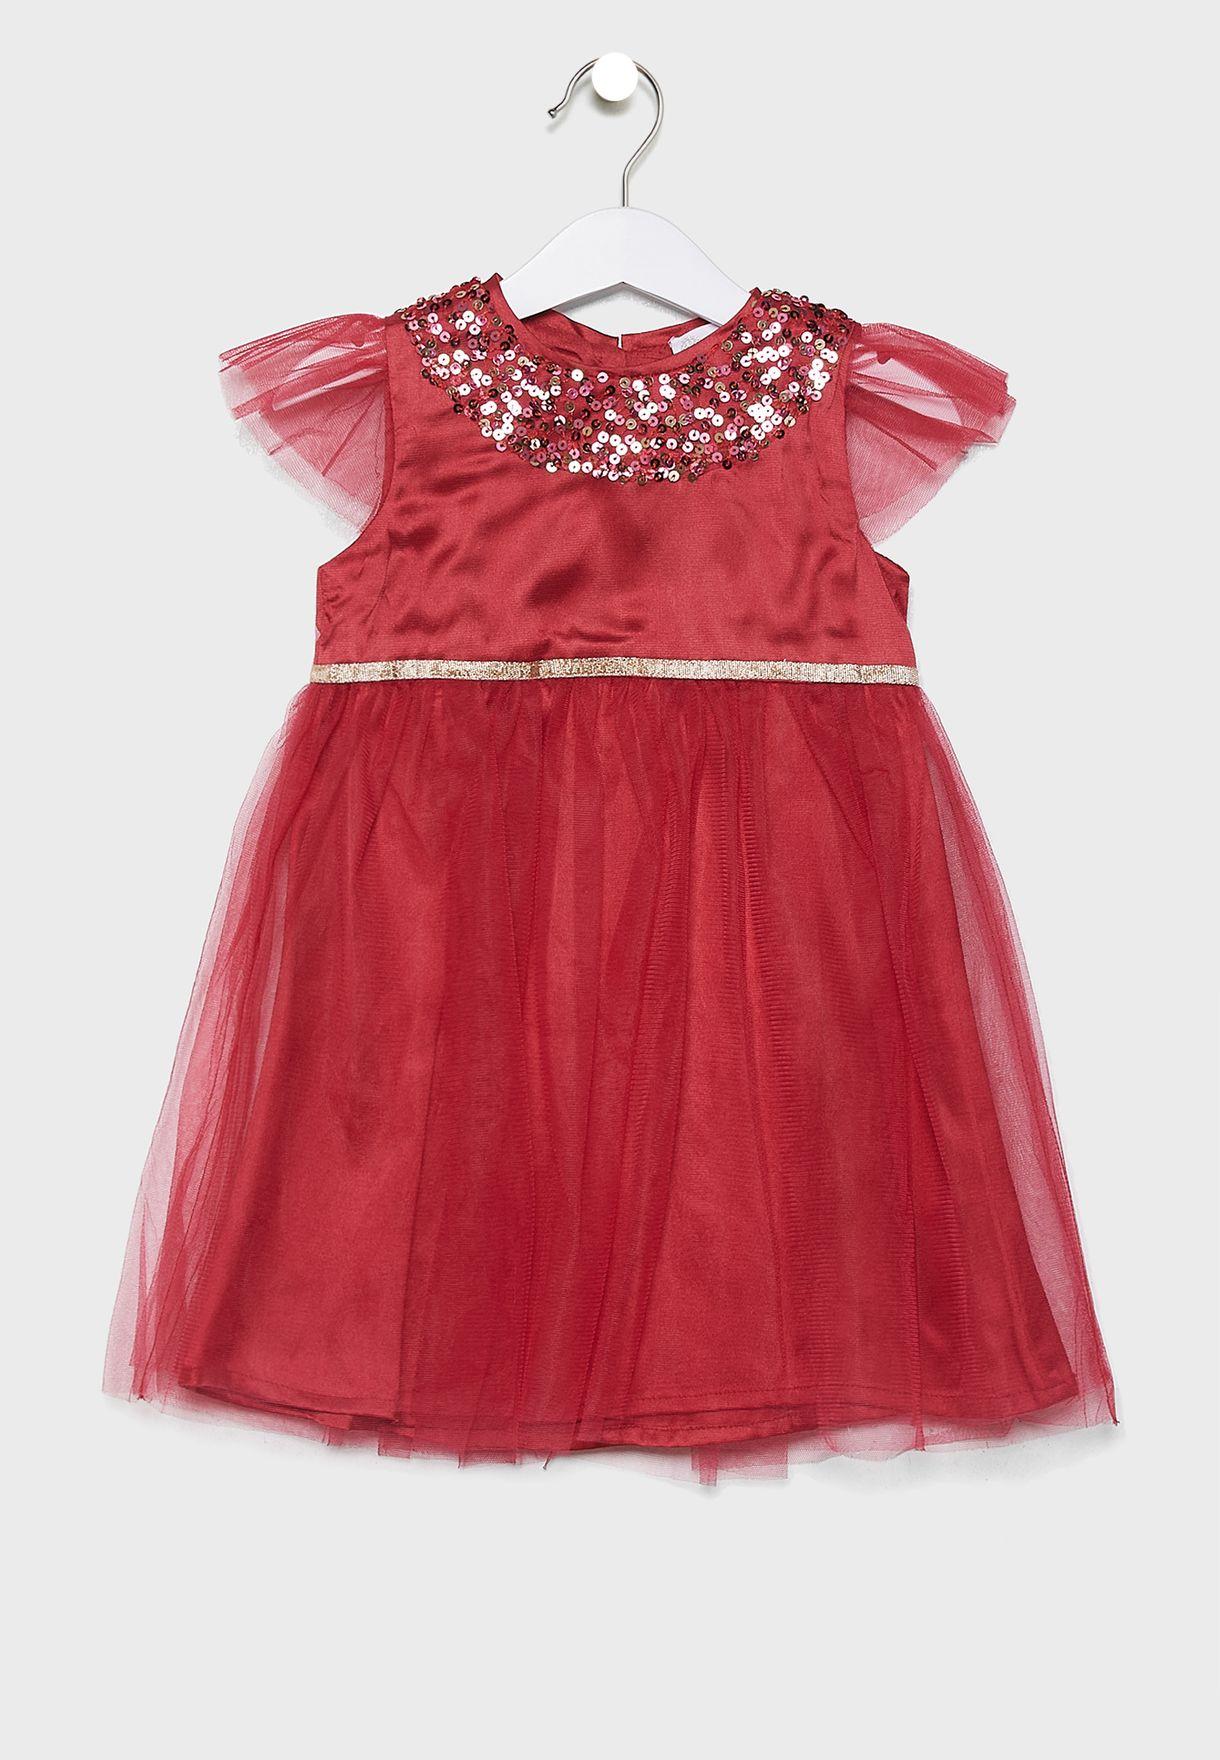 فستان احمر مخملي مرصع بترتر